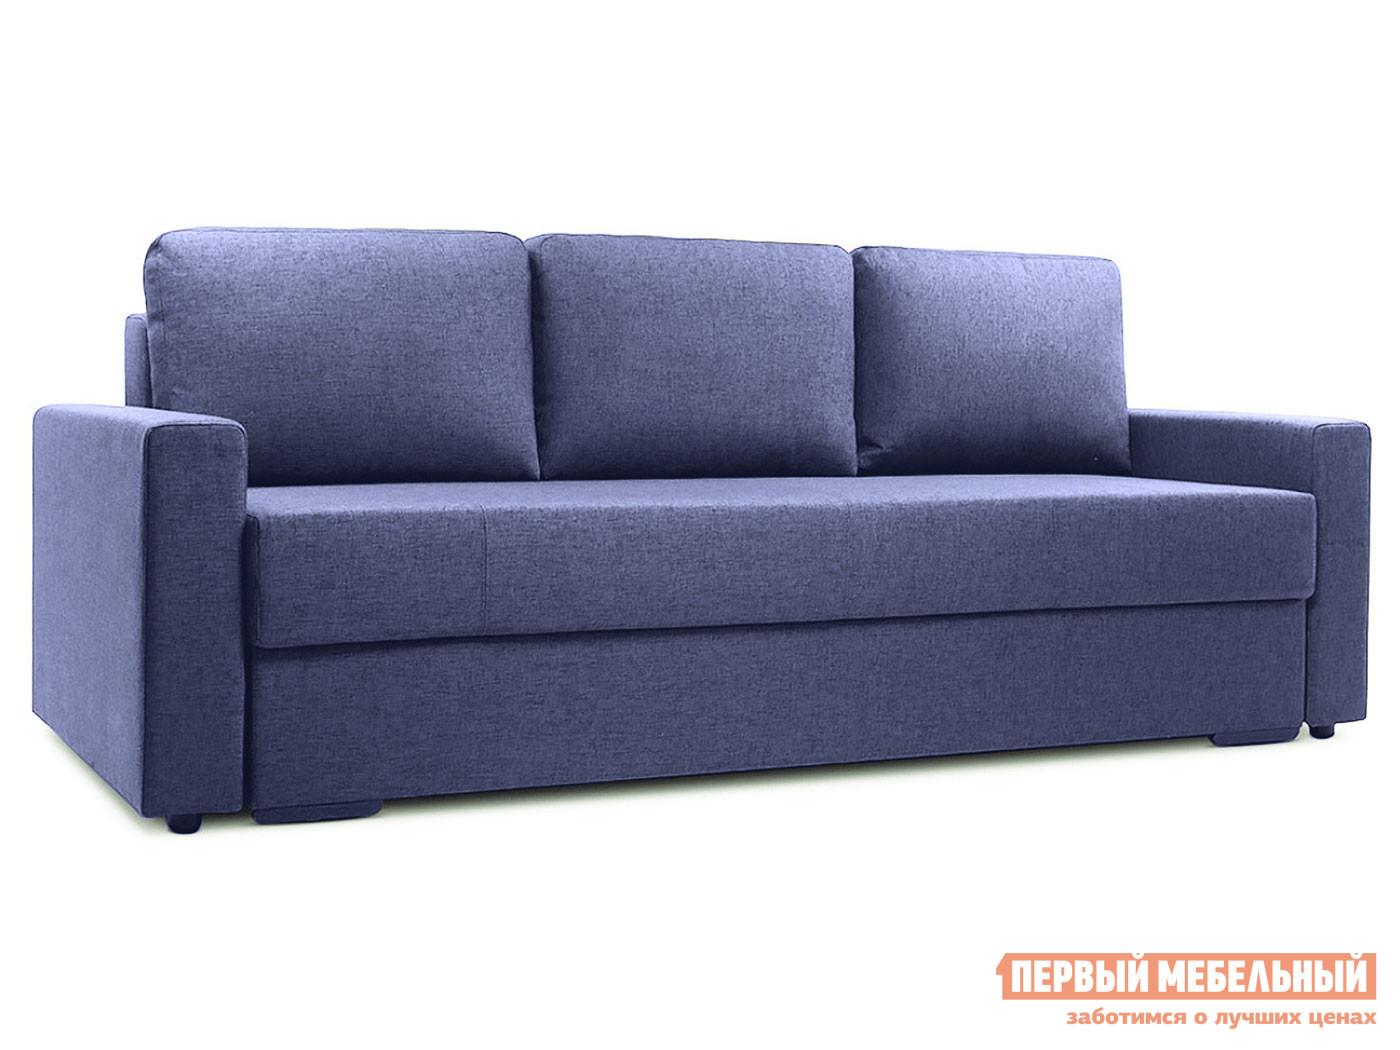 Прямой диван  Фишер Синий, рогожка